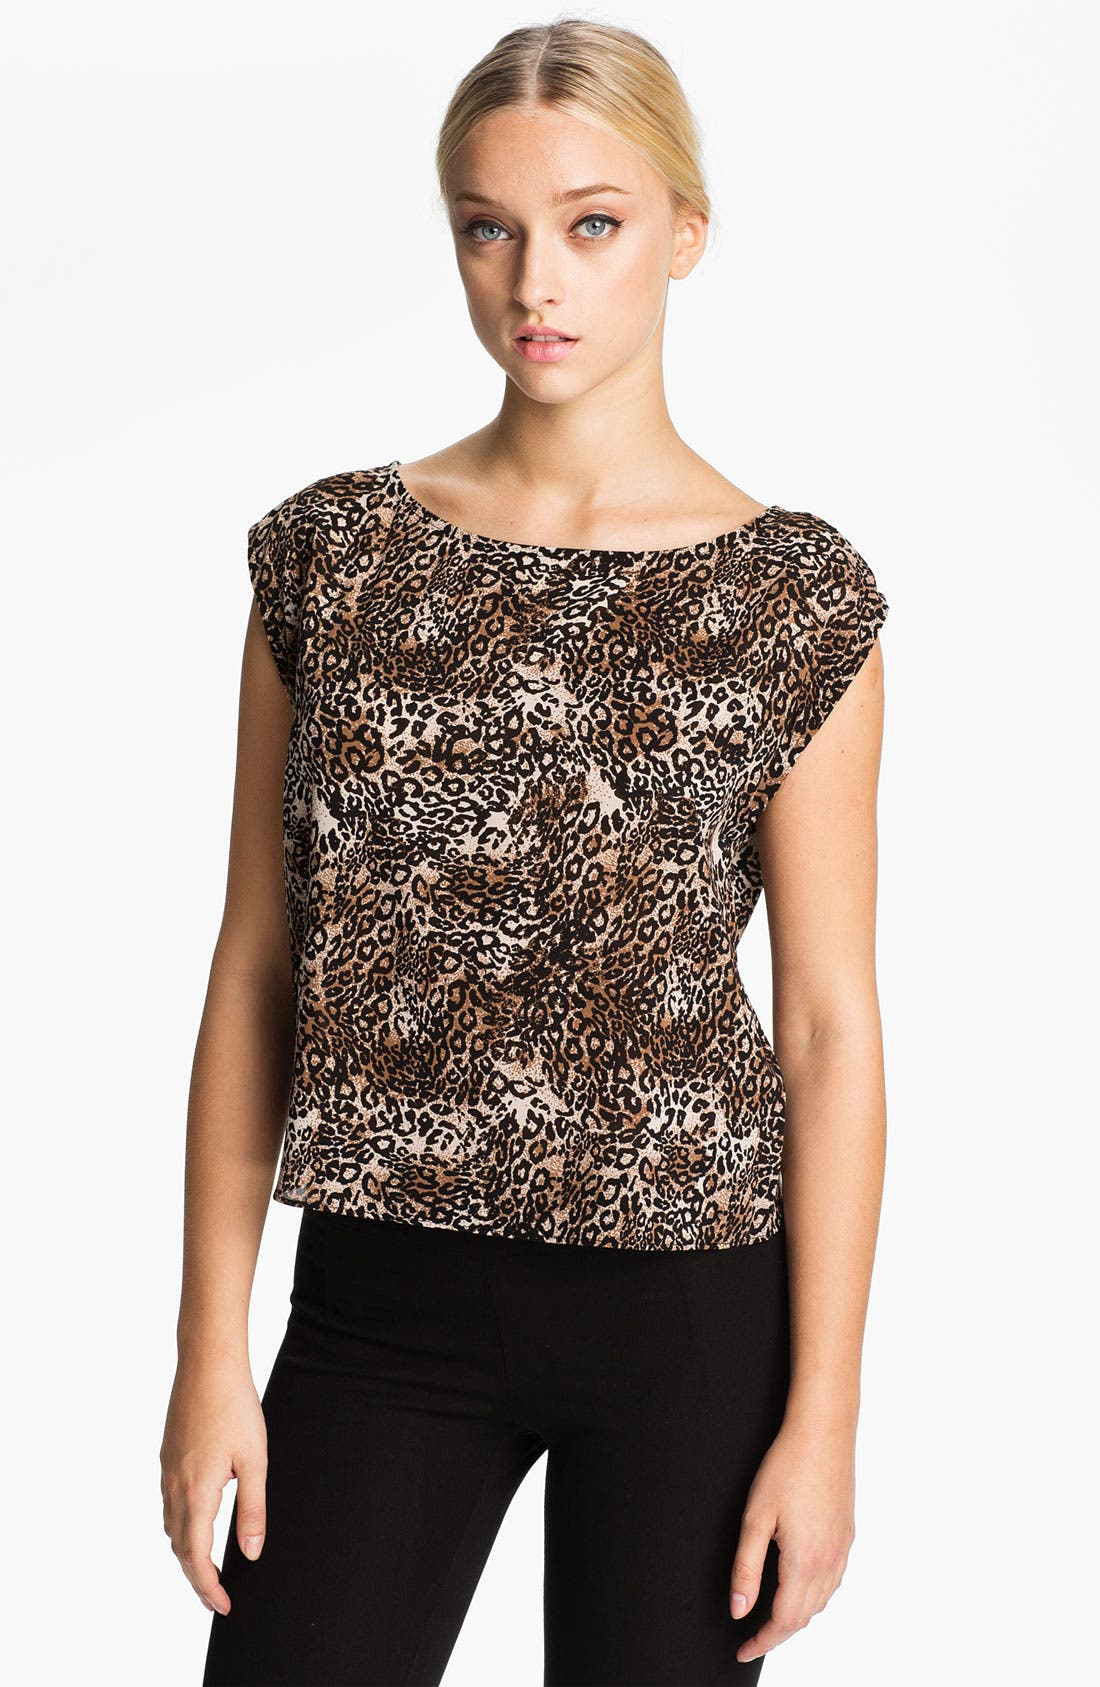 Alternate Image 1 Selected - Alice + Olivia 'Kinsley' Cheetah Print Top